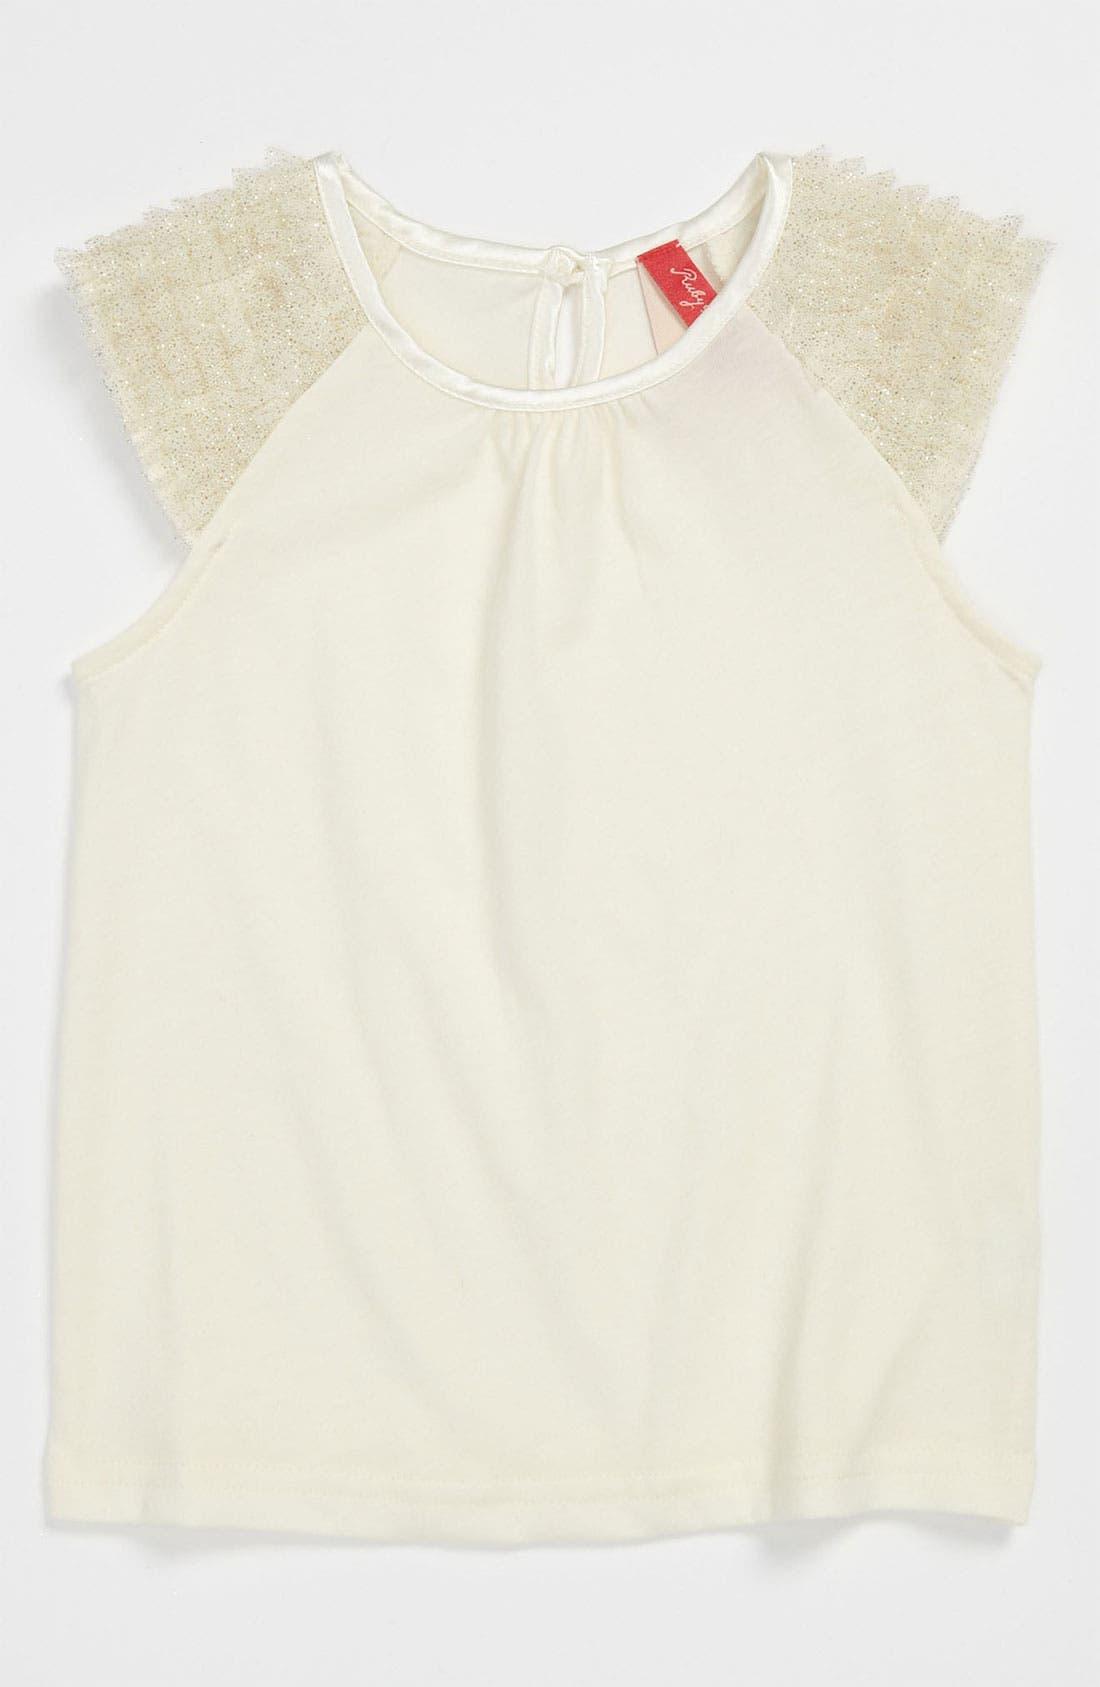 Main Image - Ruby & Bloom 'Mariah' Knit Top (Toddler)